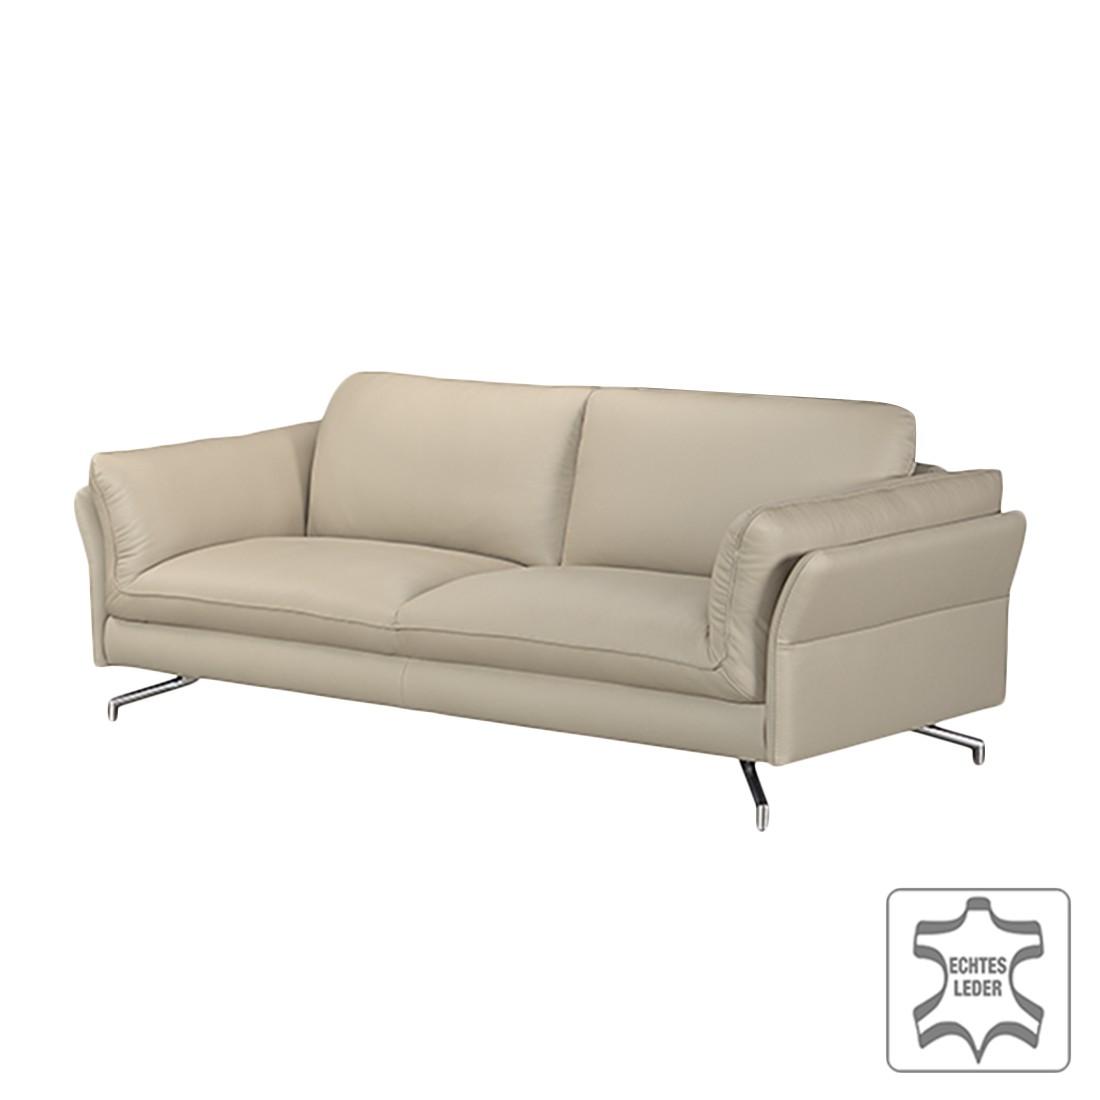 sofa enrico 2 5 sitzer echtleder beige mit 1 kopfst tze loftscape g nstig bestellen. Black Bedroom Furniture Sets. Home Design Ideas